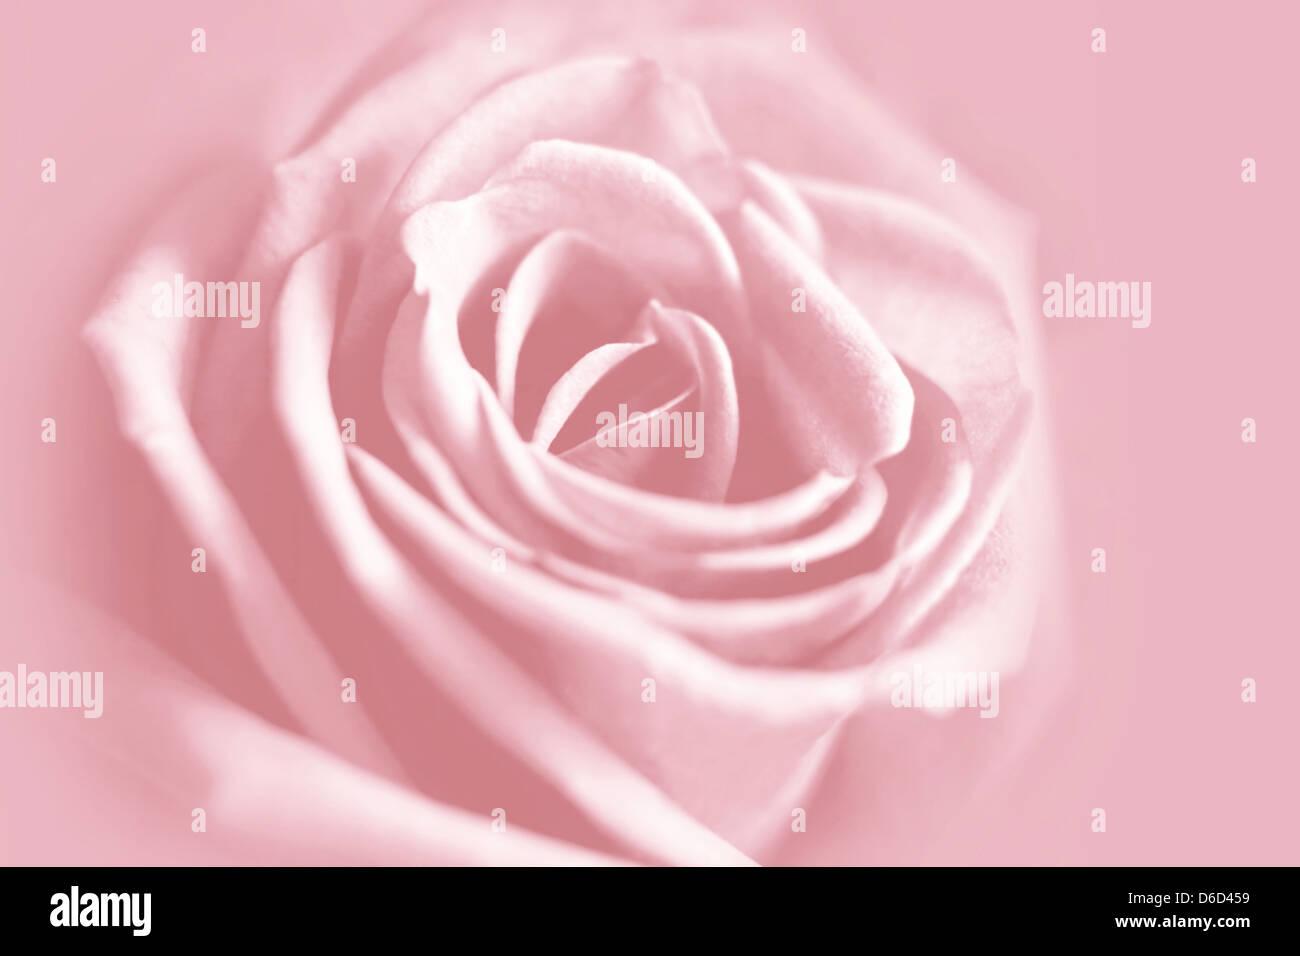 gentle pink rose background - Stock Image